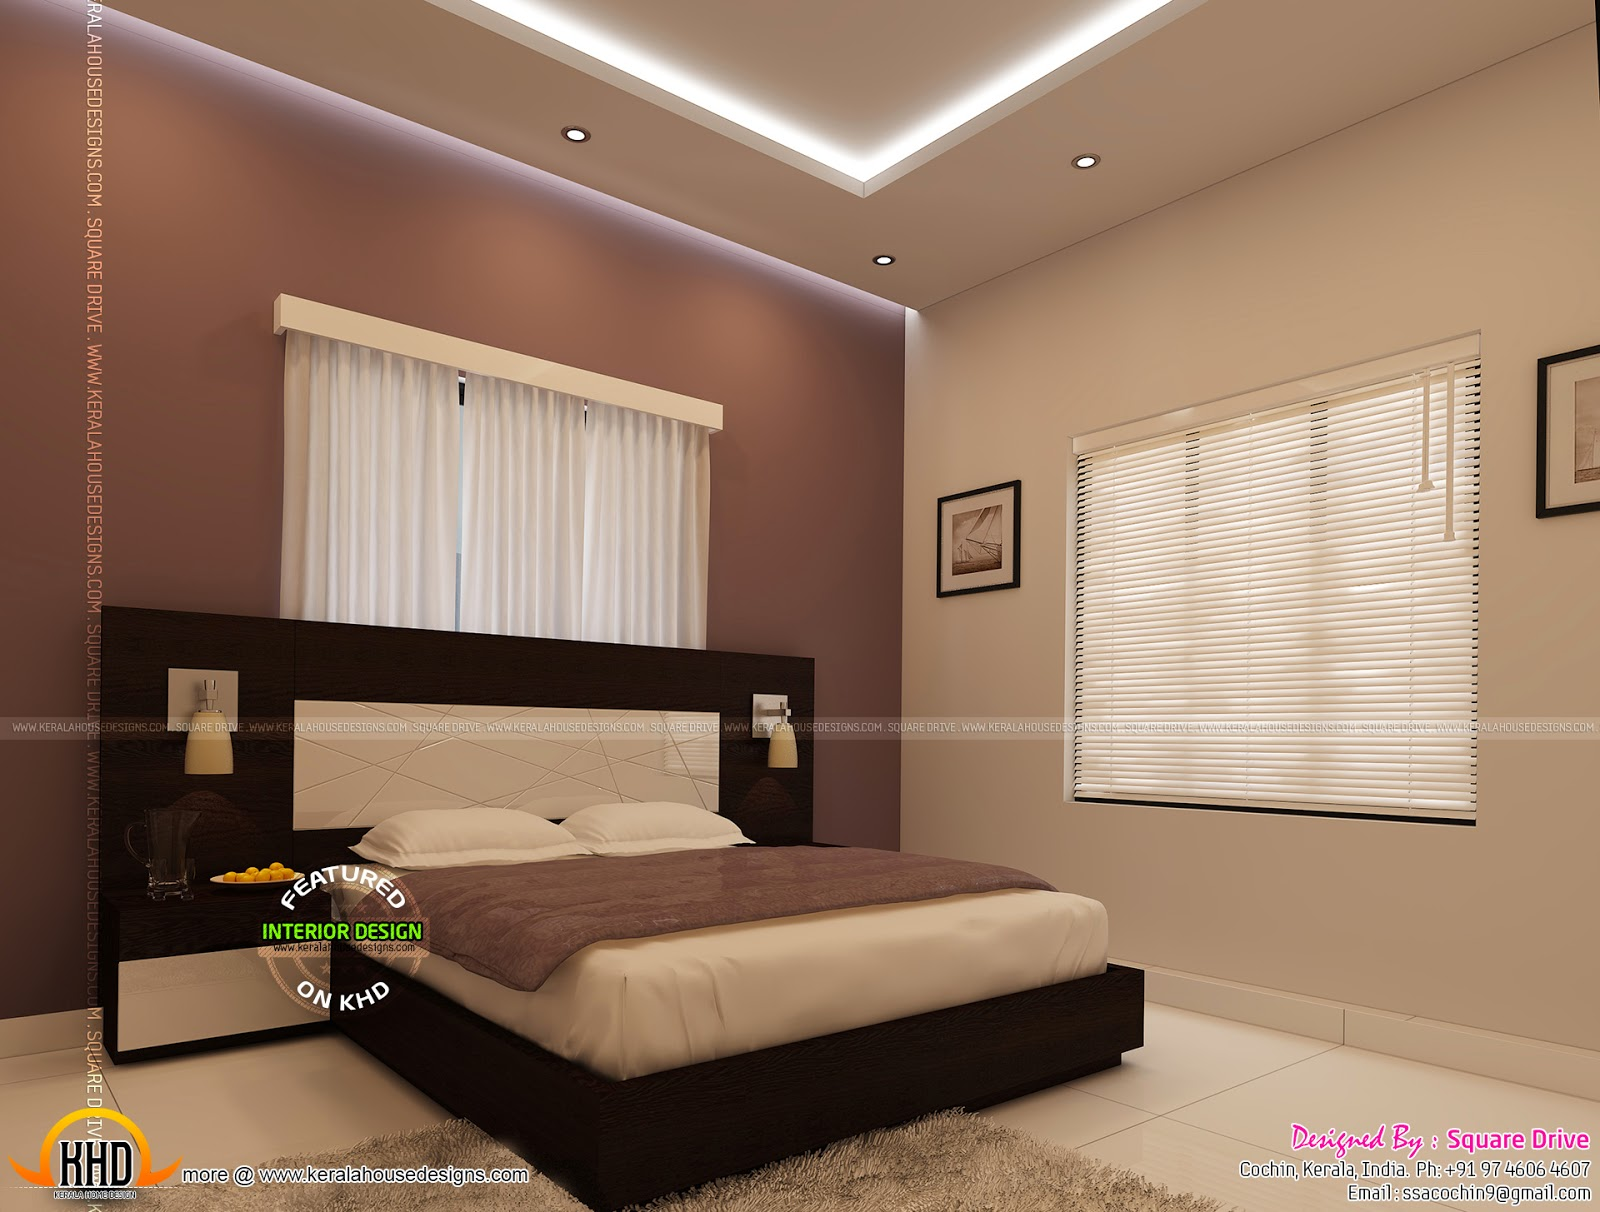 Home interior designing cochin kerala Home interior design kottayam